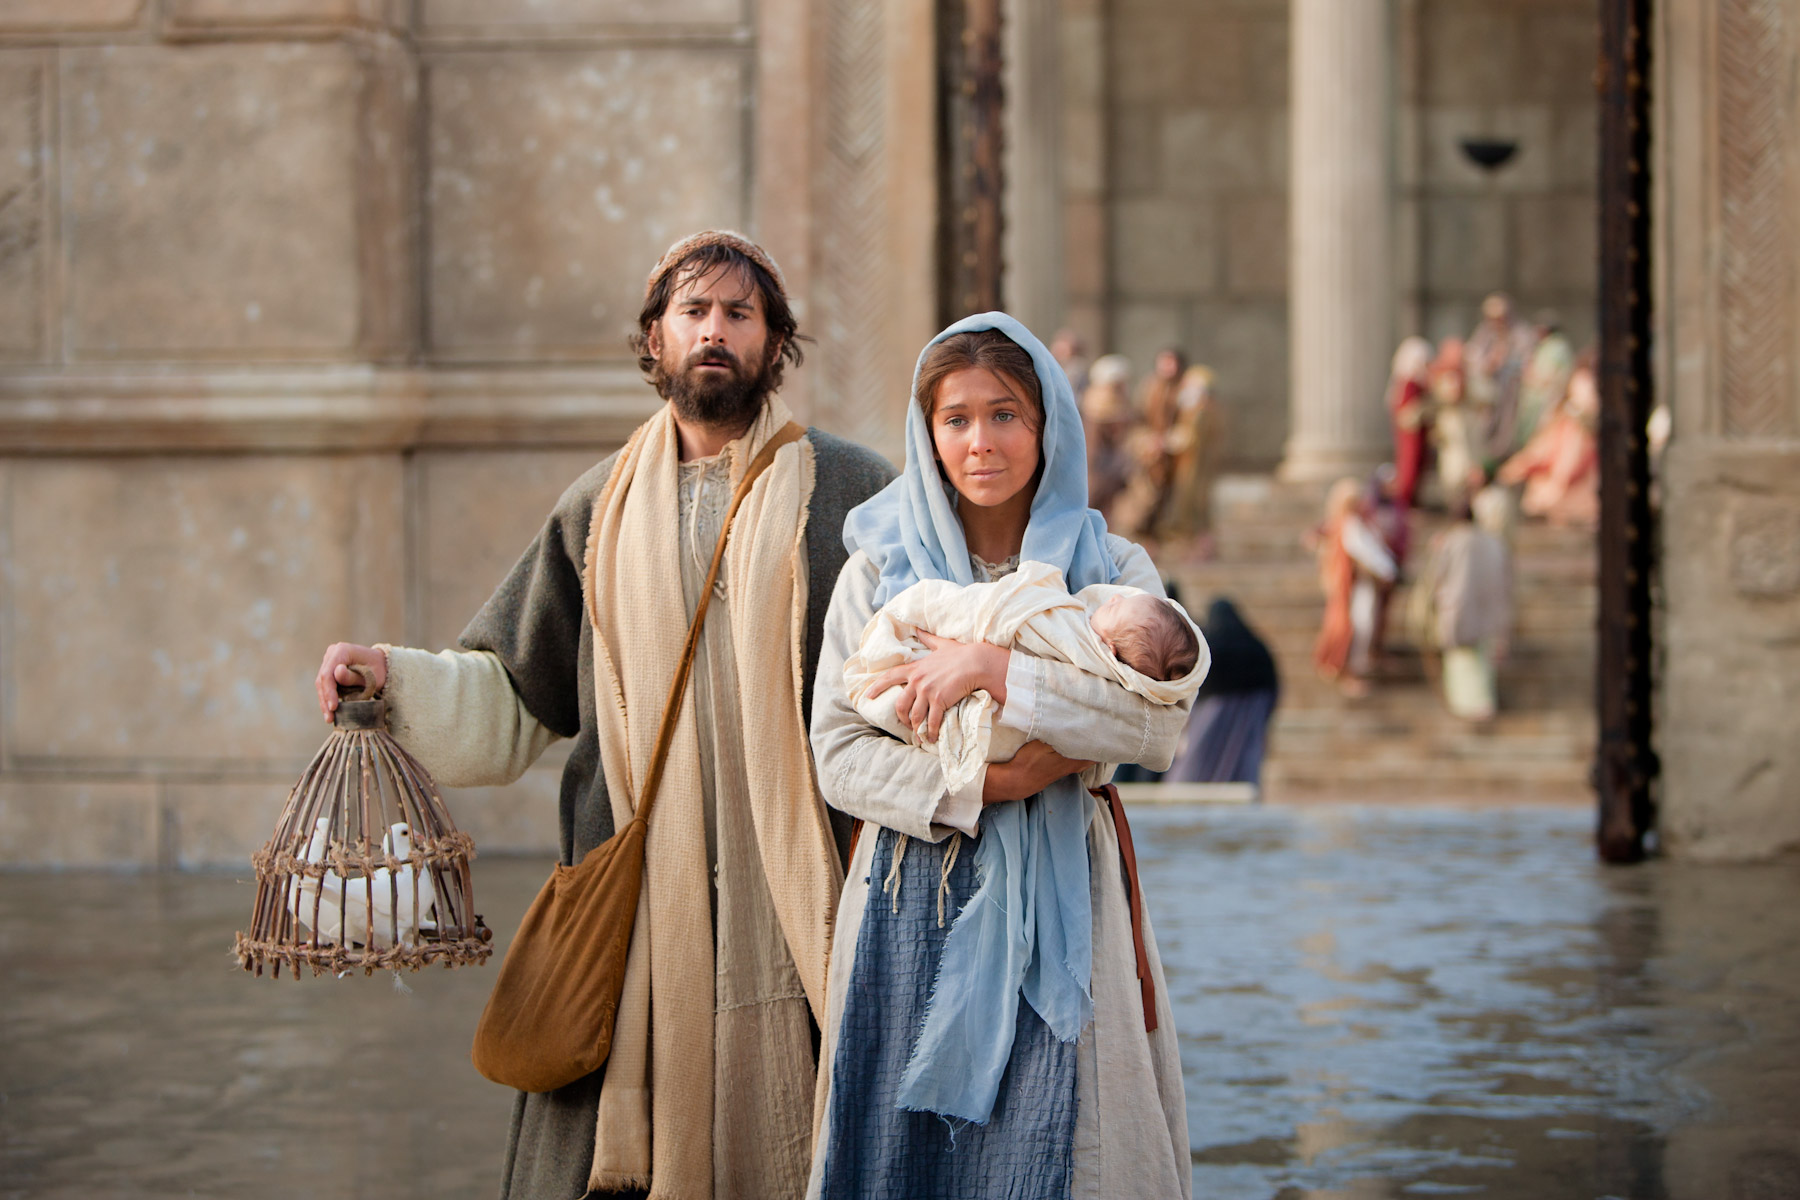 mary-and-joseph-present-the-christ-child.jpg